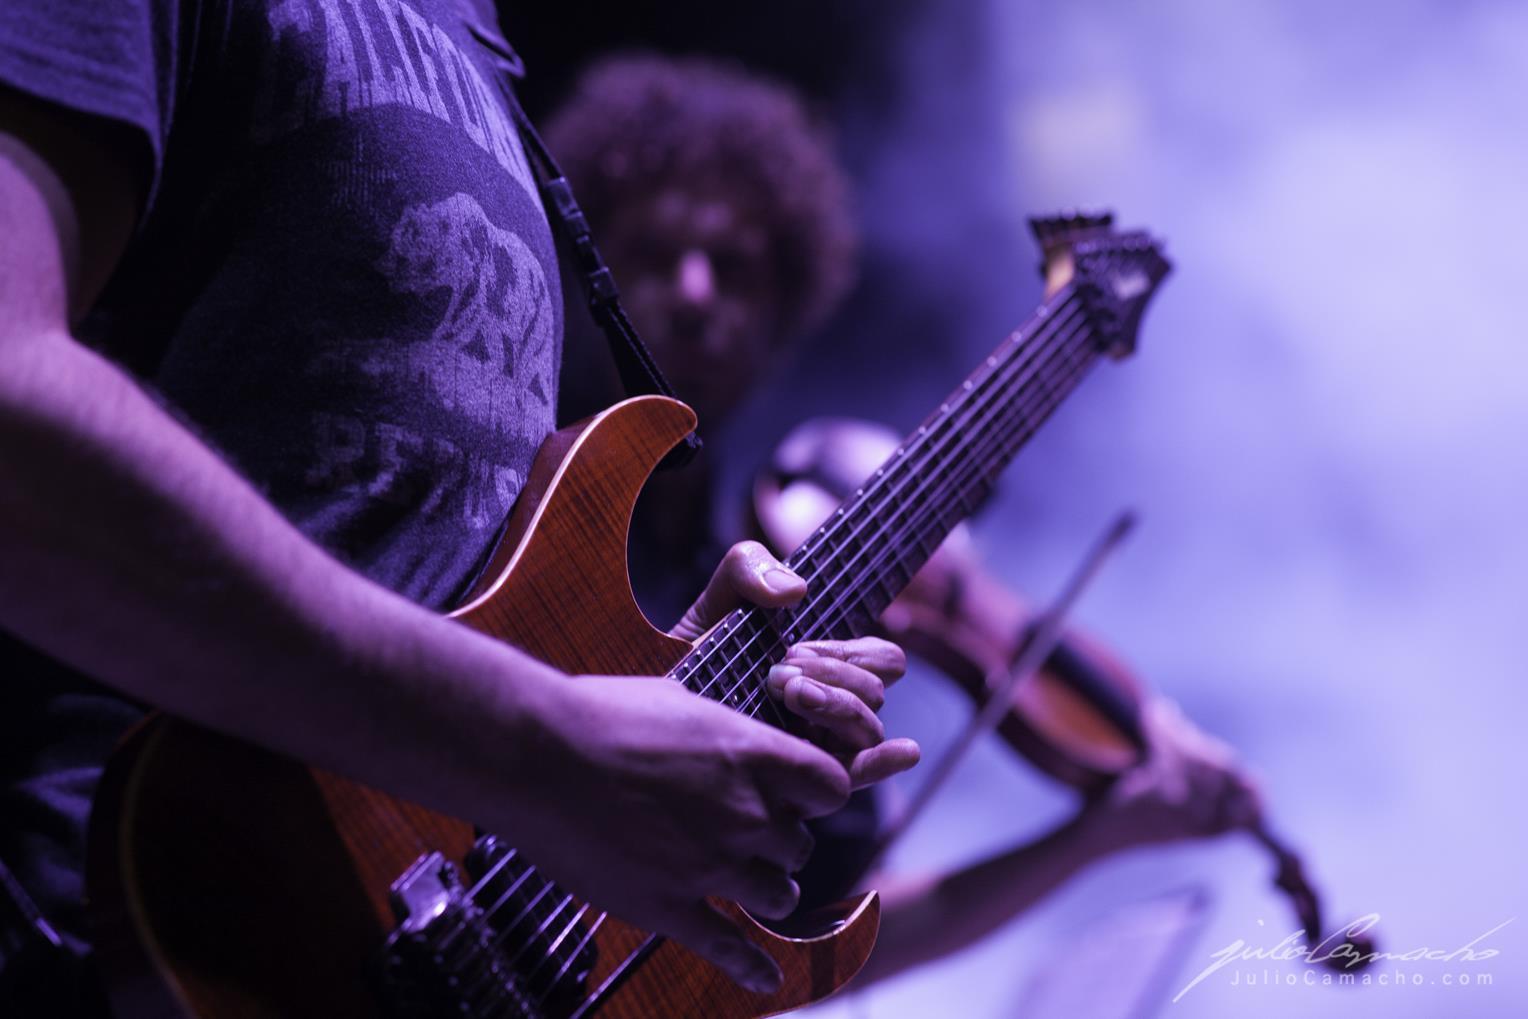 2014-10-30 31 CAST TOUR Ensenada y Tijuana - 1795 - www.Juli (Copy).jpg